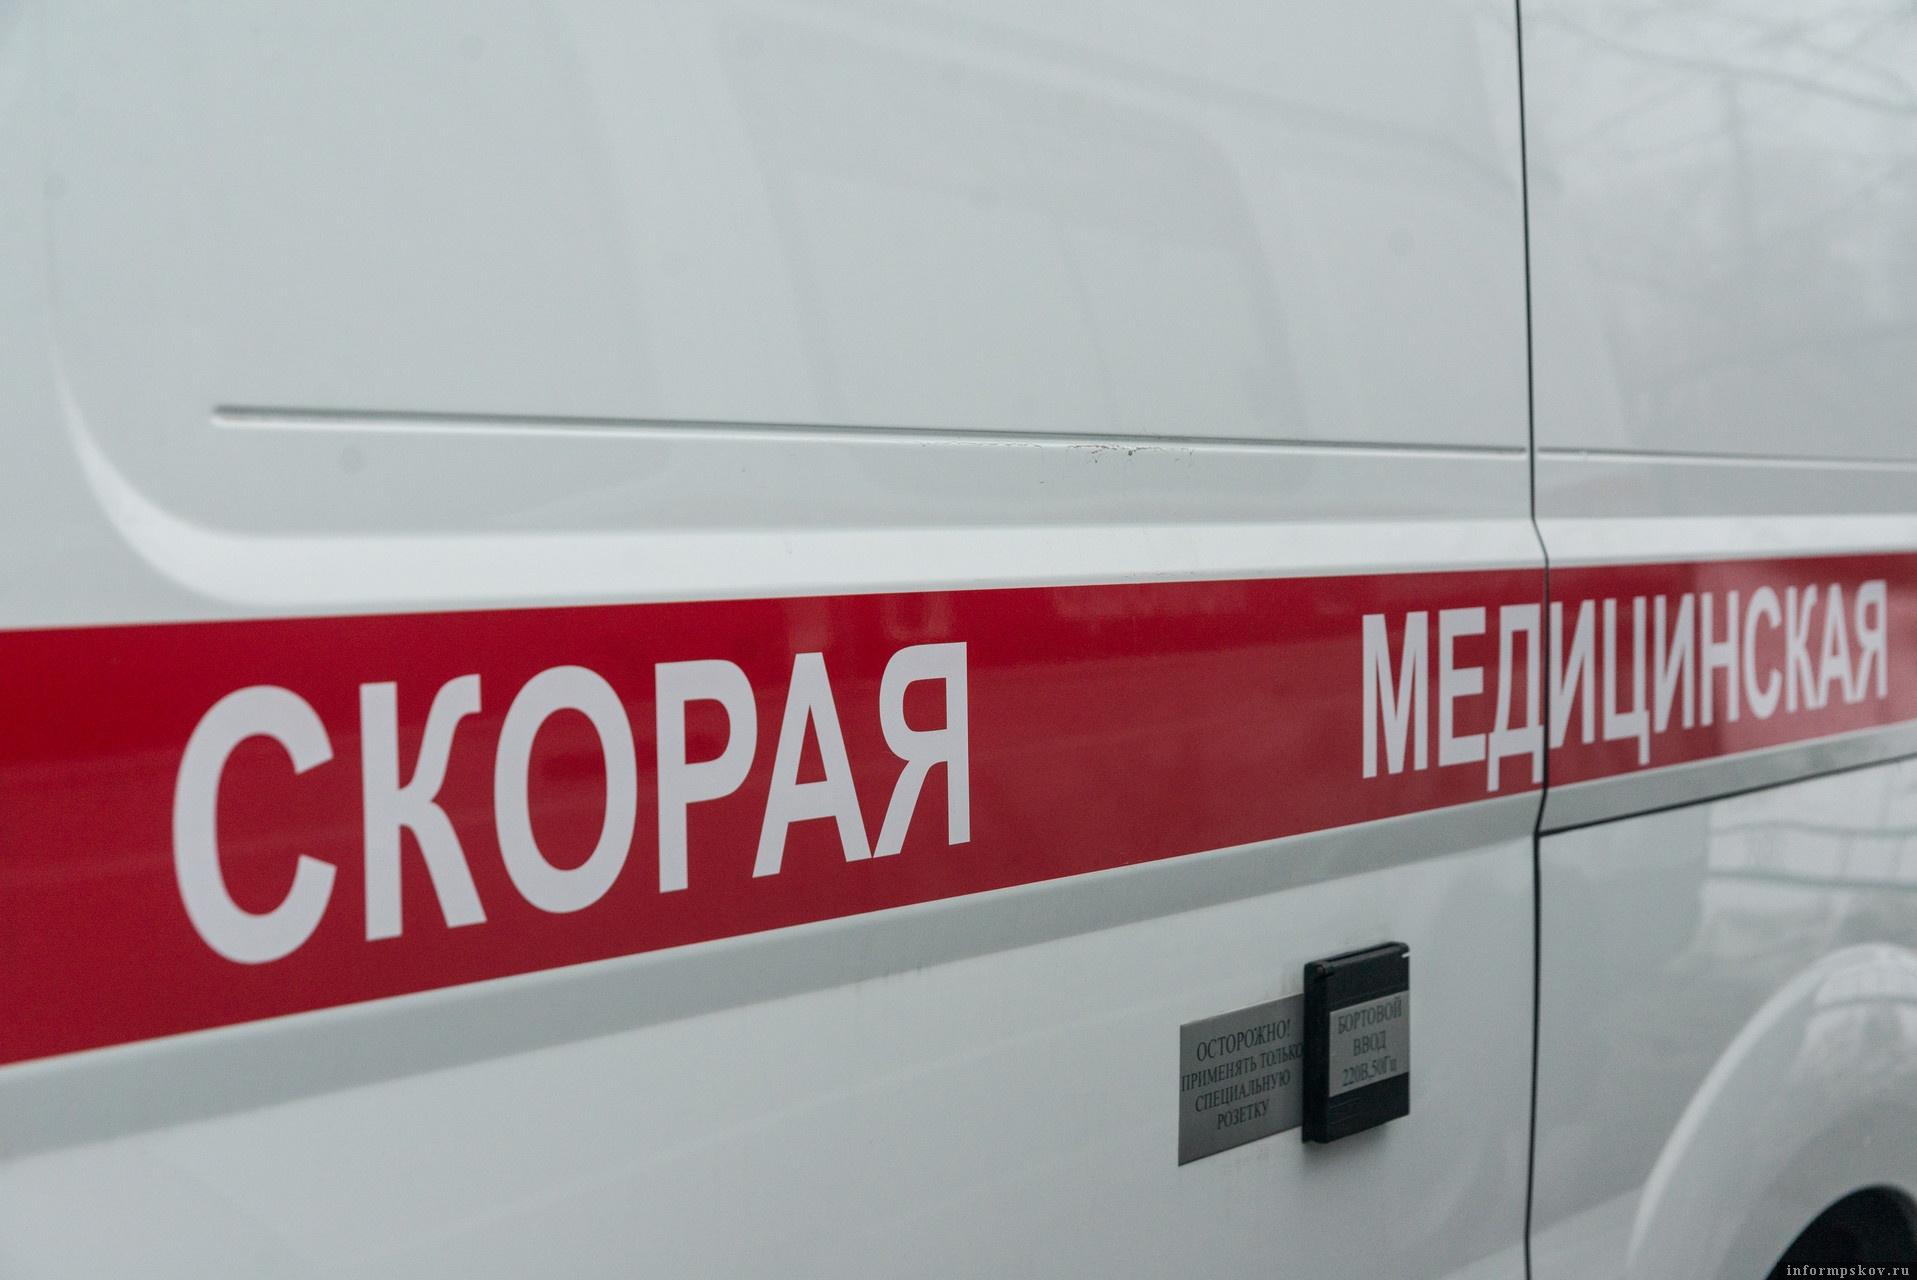 Всего на 25 апреля в Псковской области умерло 8 пациентов. Фото: Дарья Хваткова.